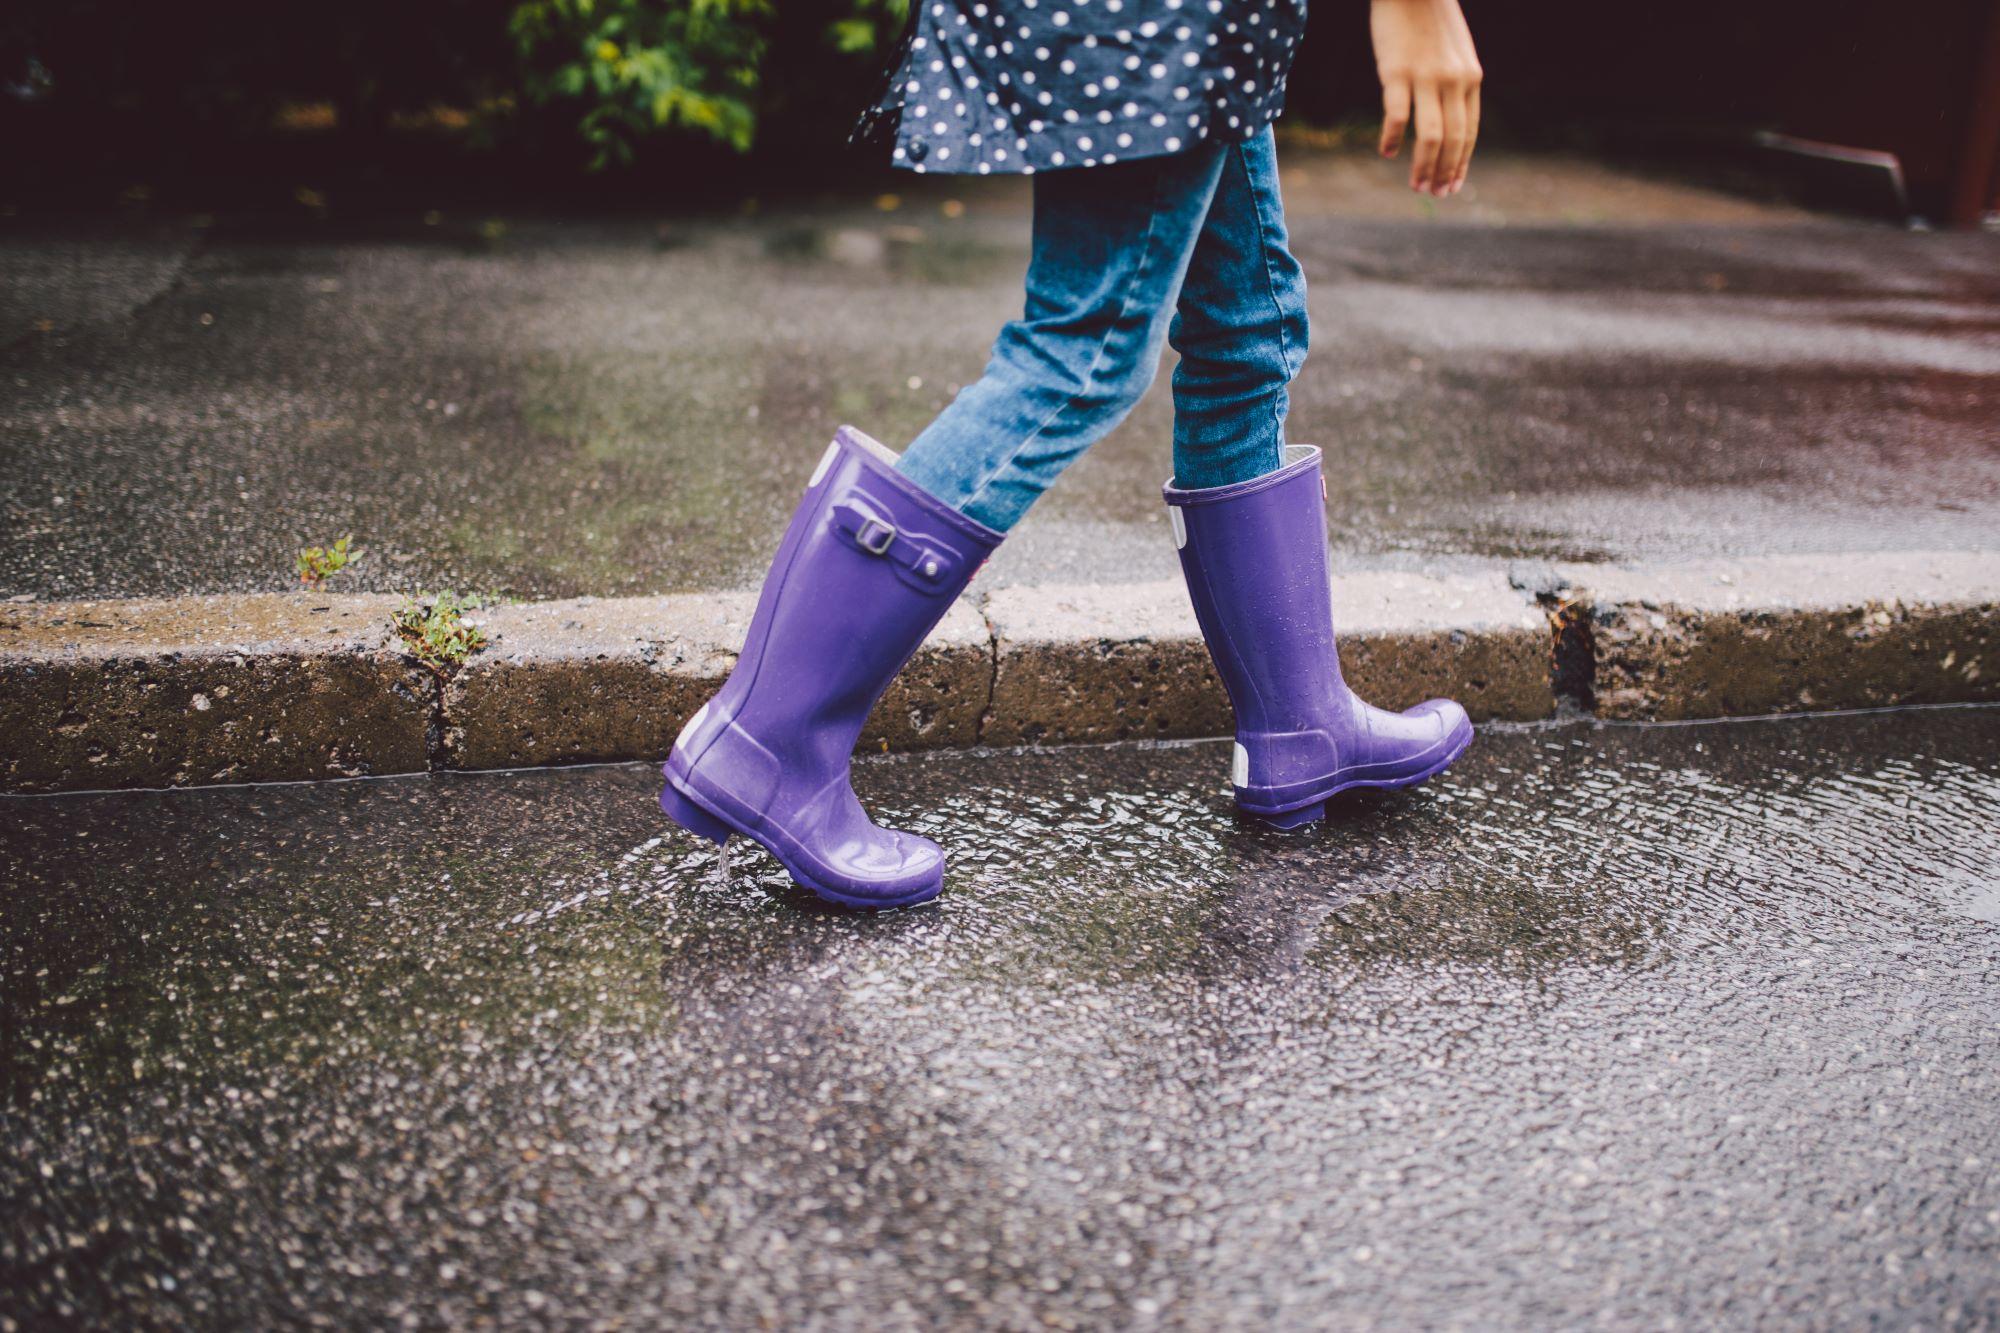 Girl walking down pavement in purple wellies